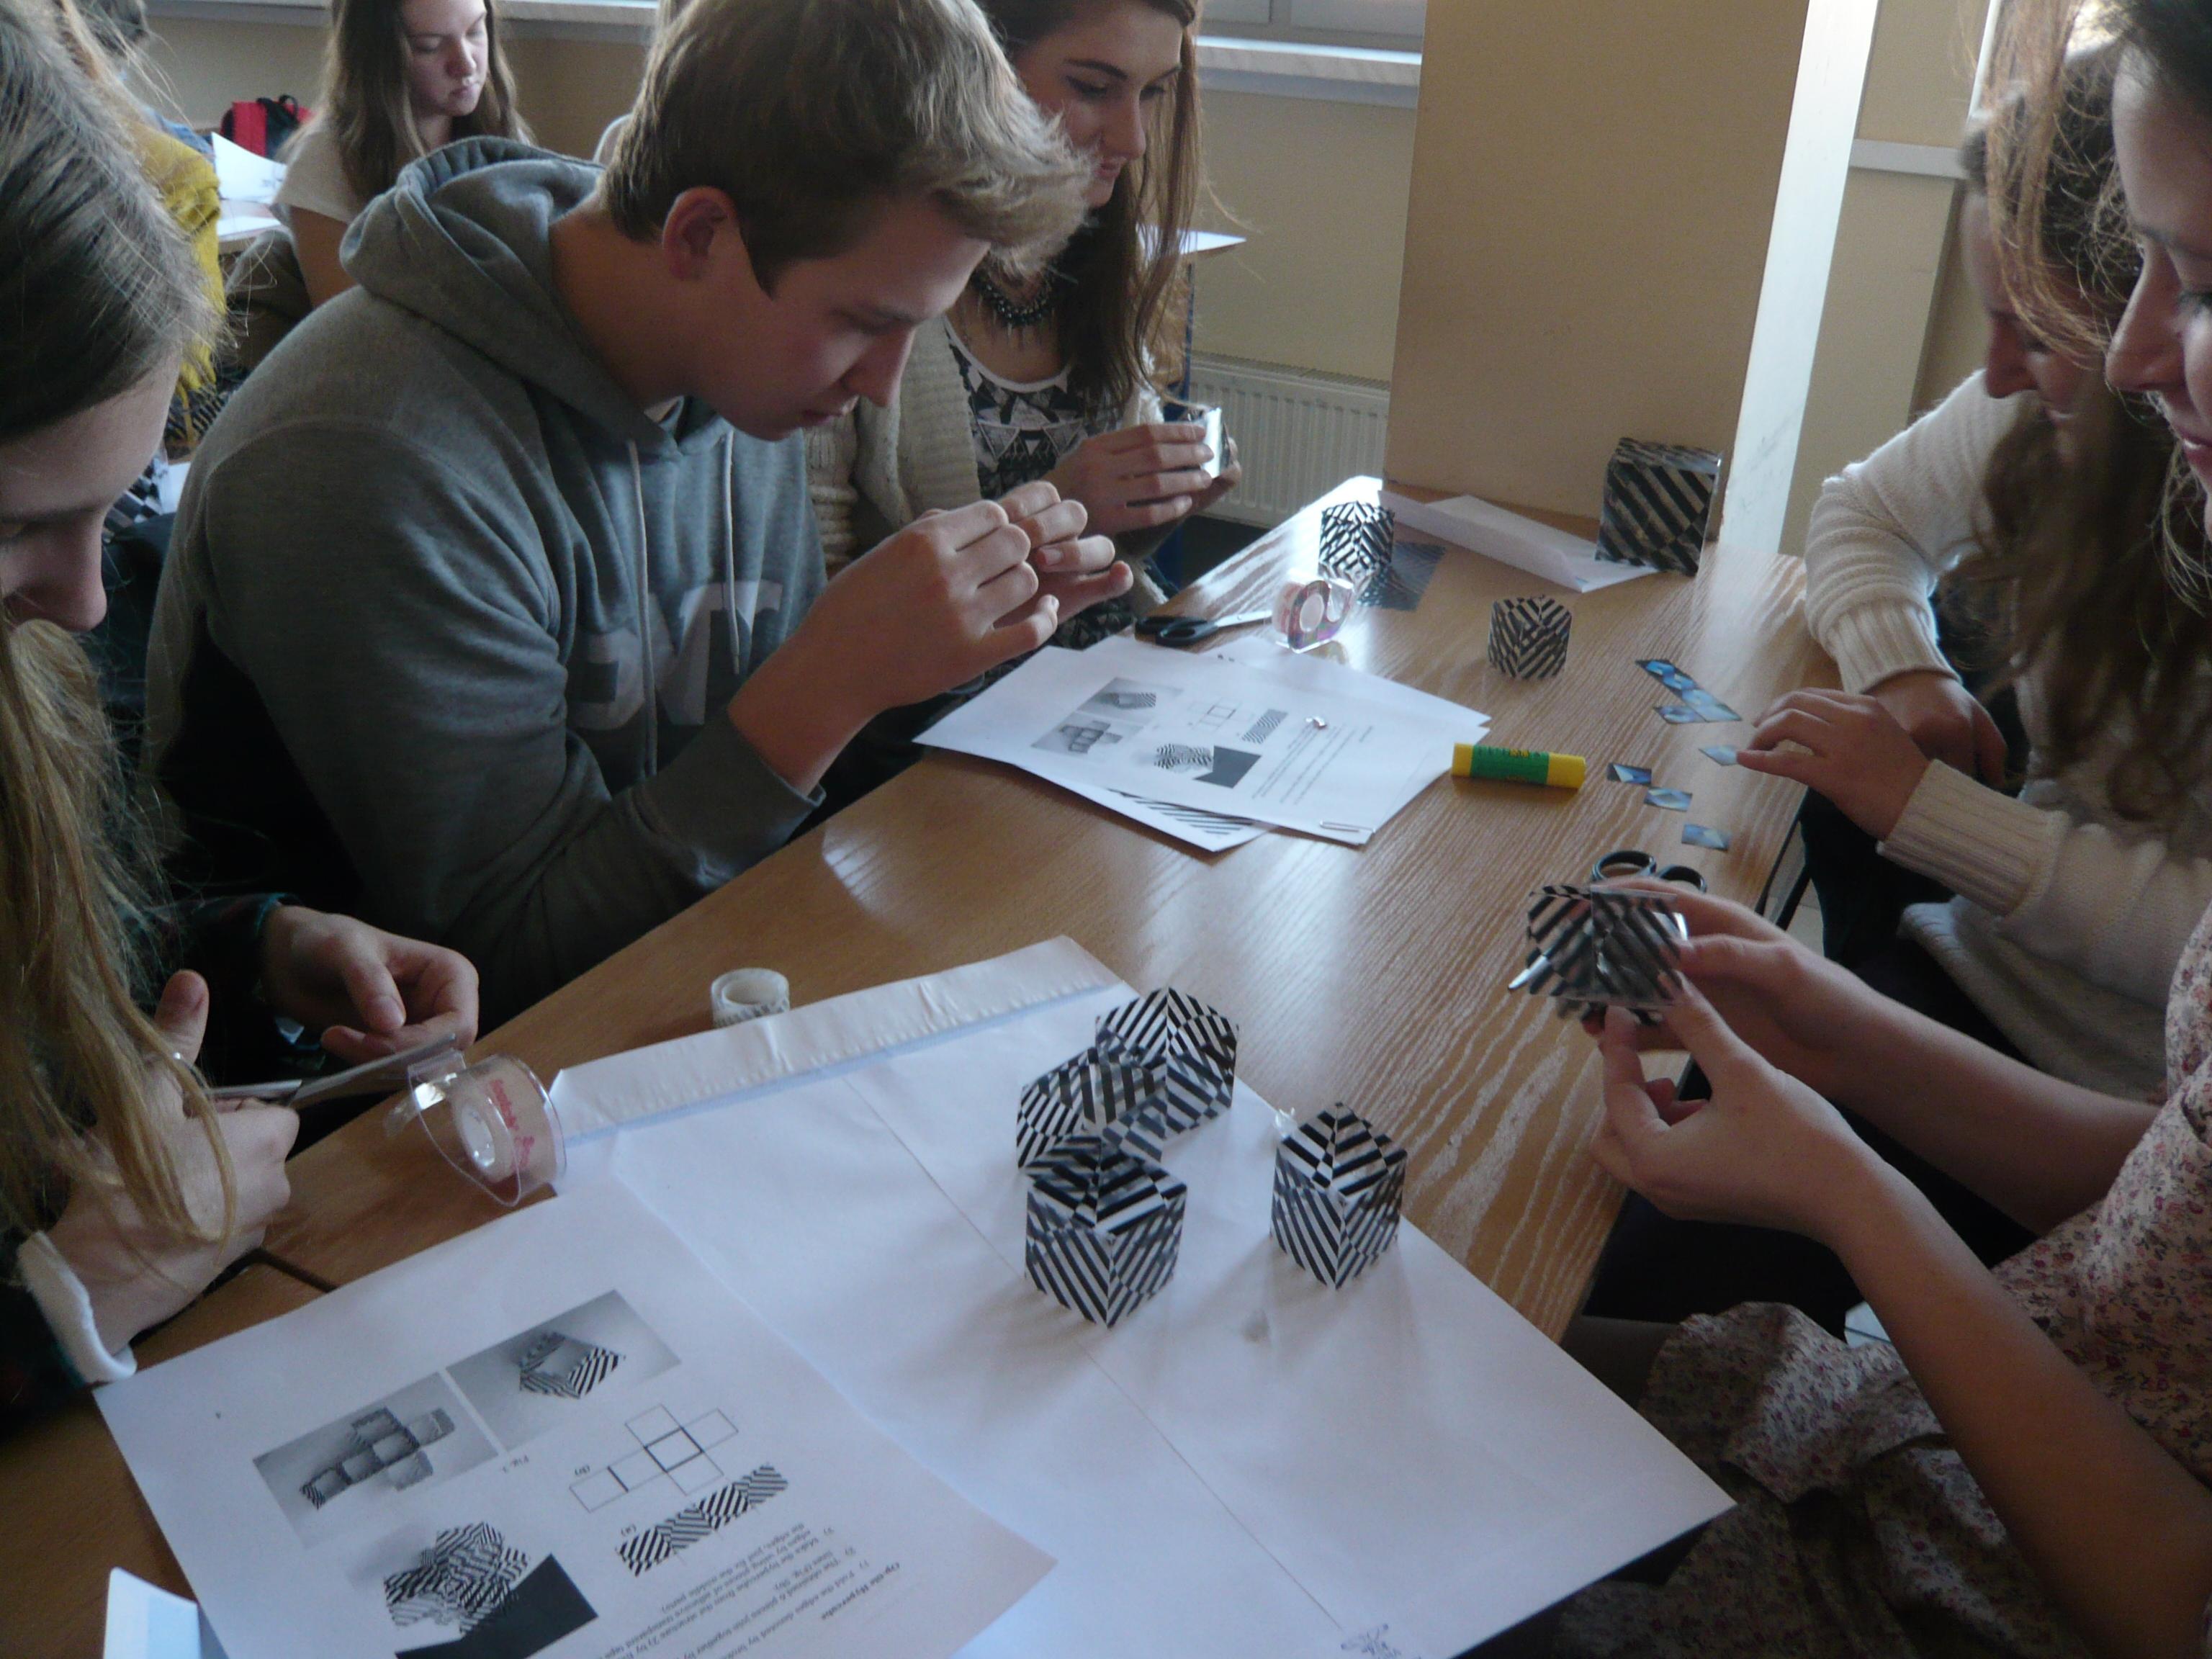 Polish students at Slavik Jablan's Visual mathematics workshop in Wroclaw